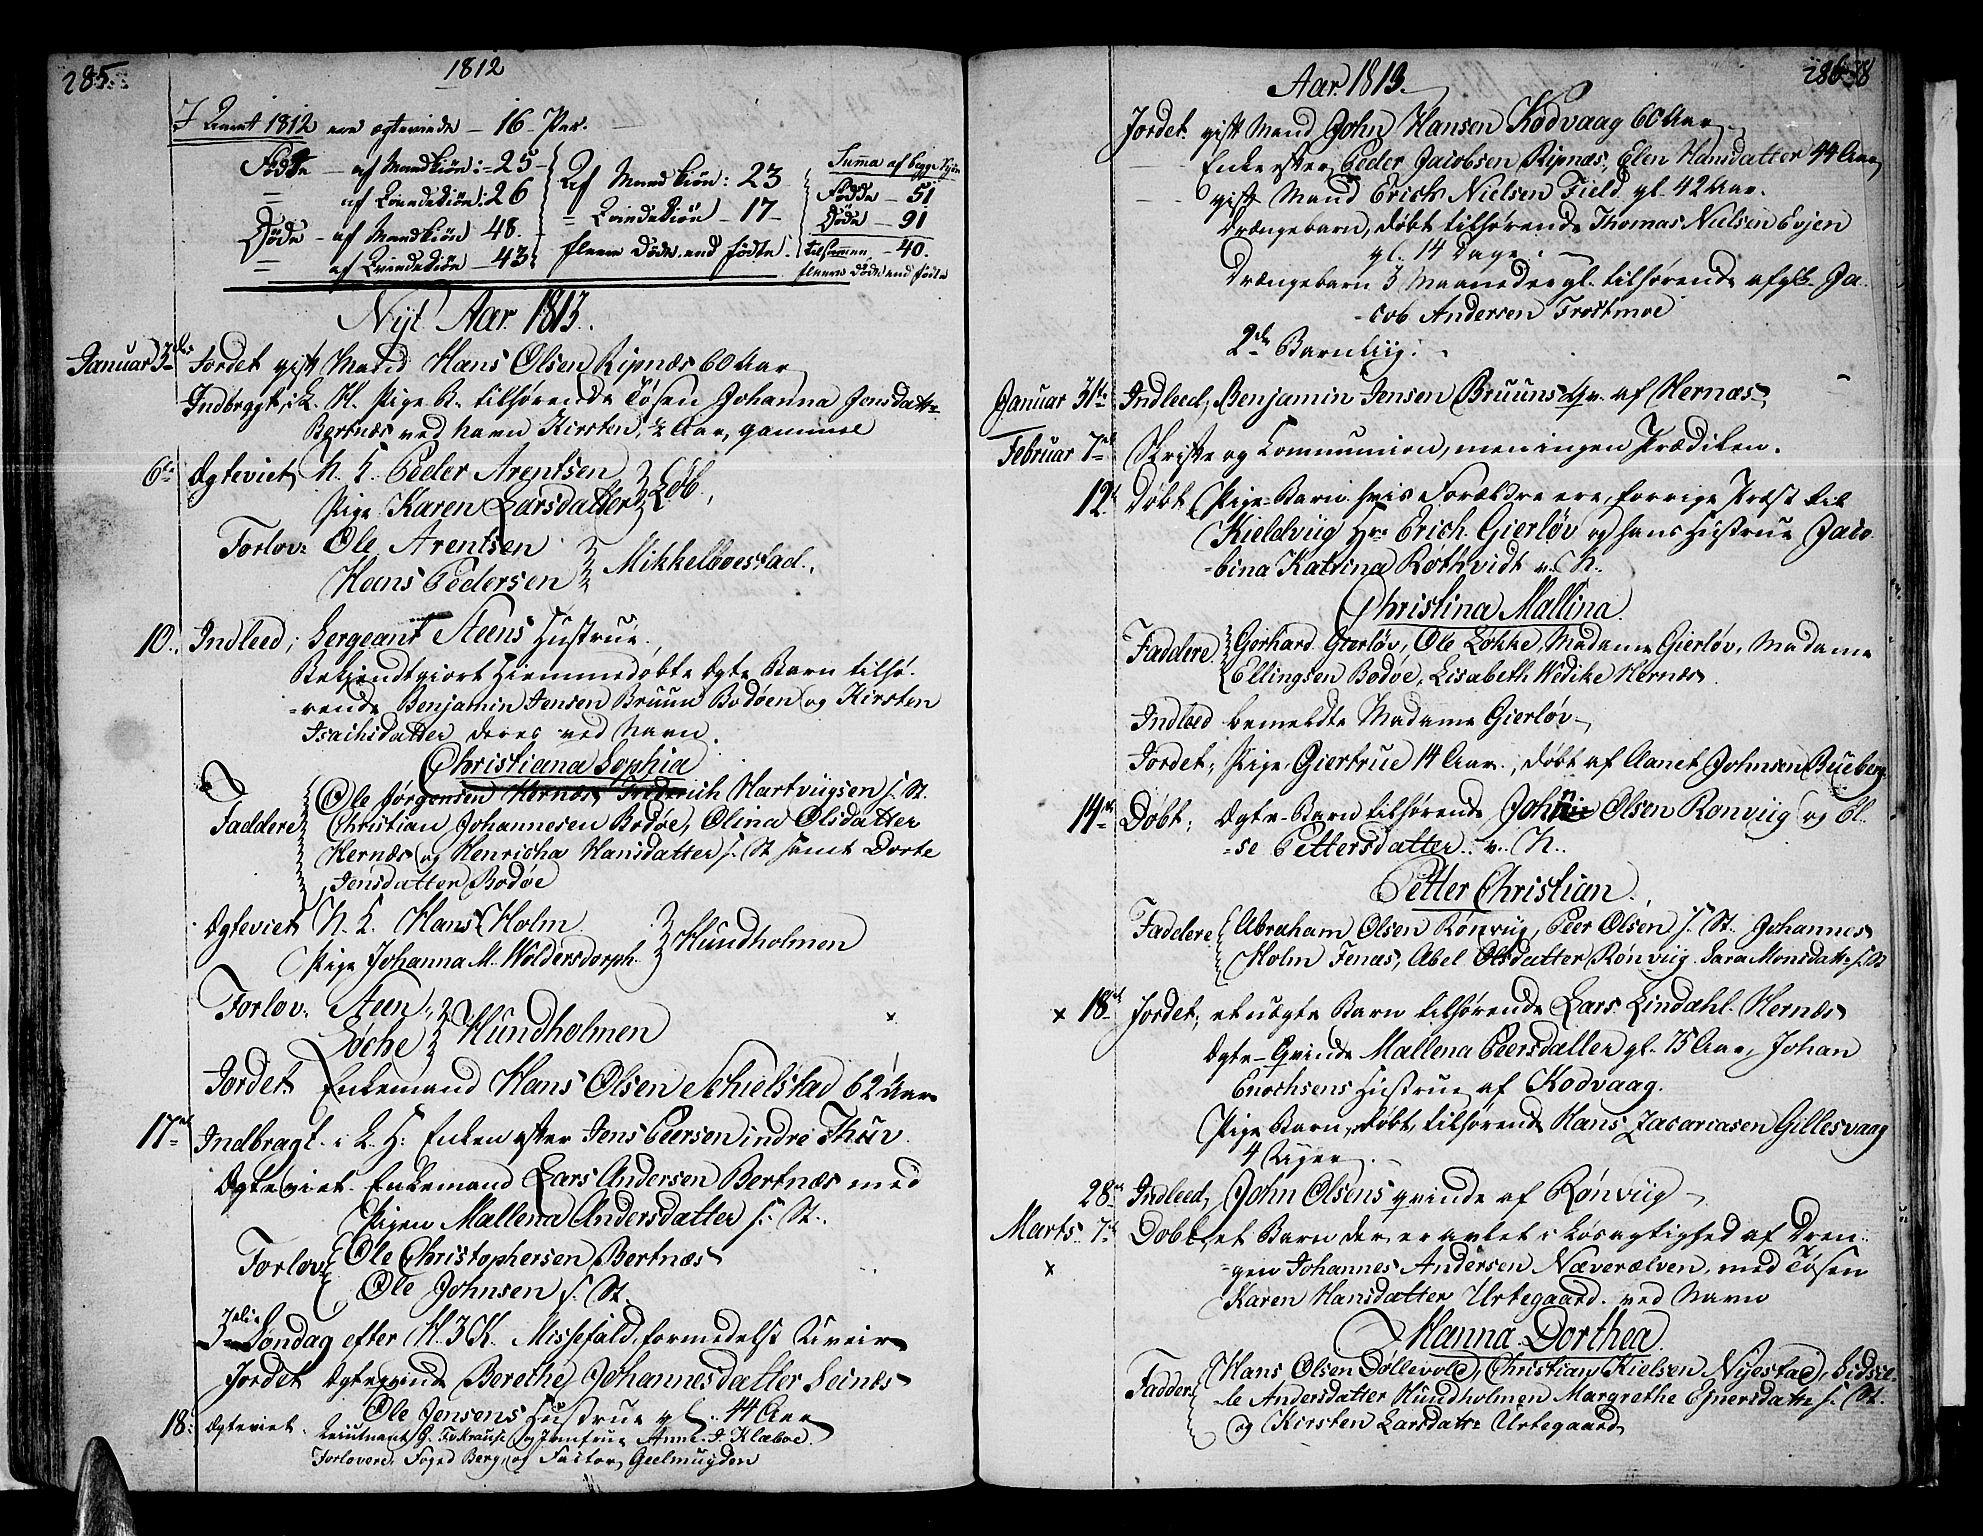 SAT, Ministerialprotokoller, klokkerbøker og fødselsregistre - Nordland, 801/L0004: Ministerialbok nr. 801A04, 1796-1817, s. 285-286